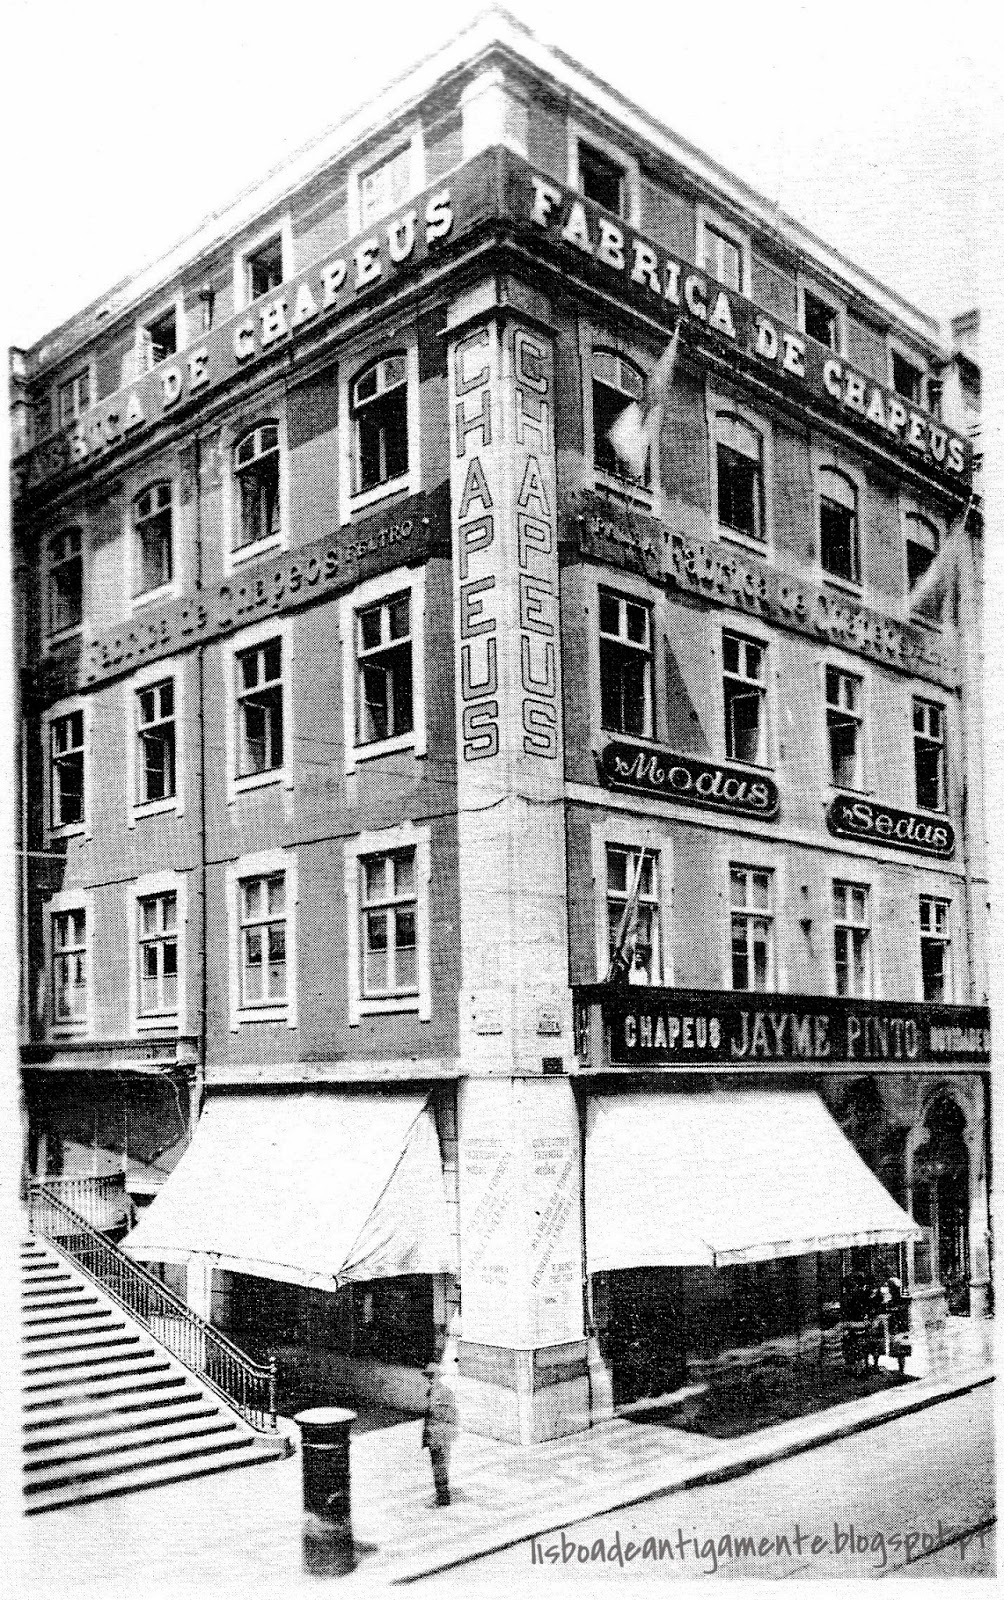 Fábrica de chapéus Jayme Pinto  c. 1920  Rua Áurea f22a7788d90